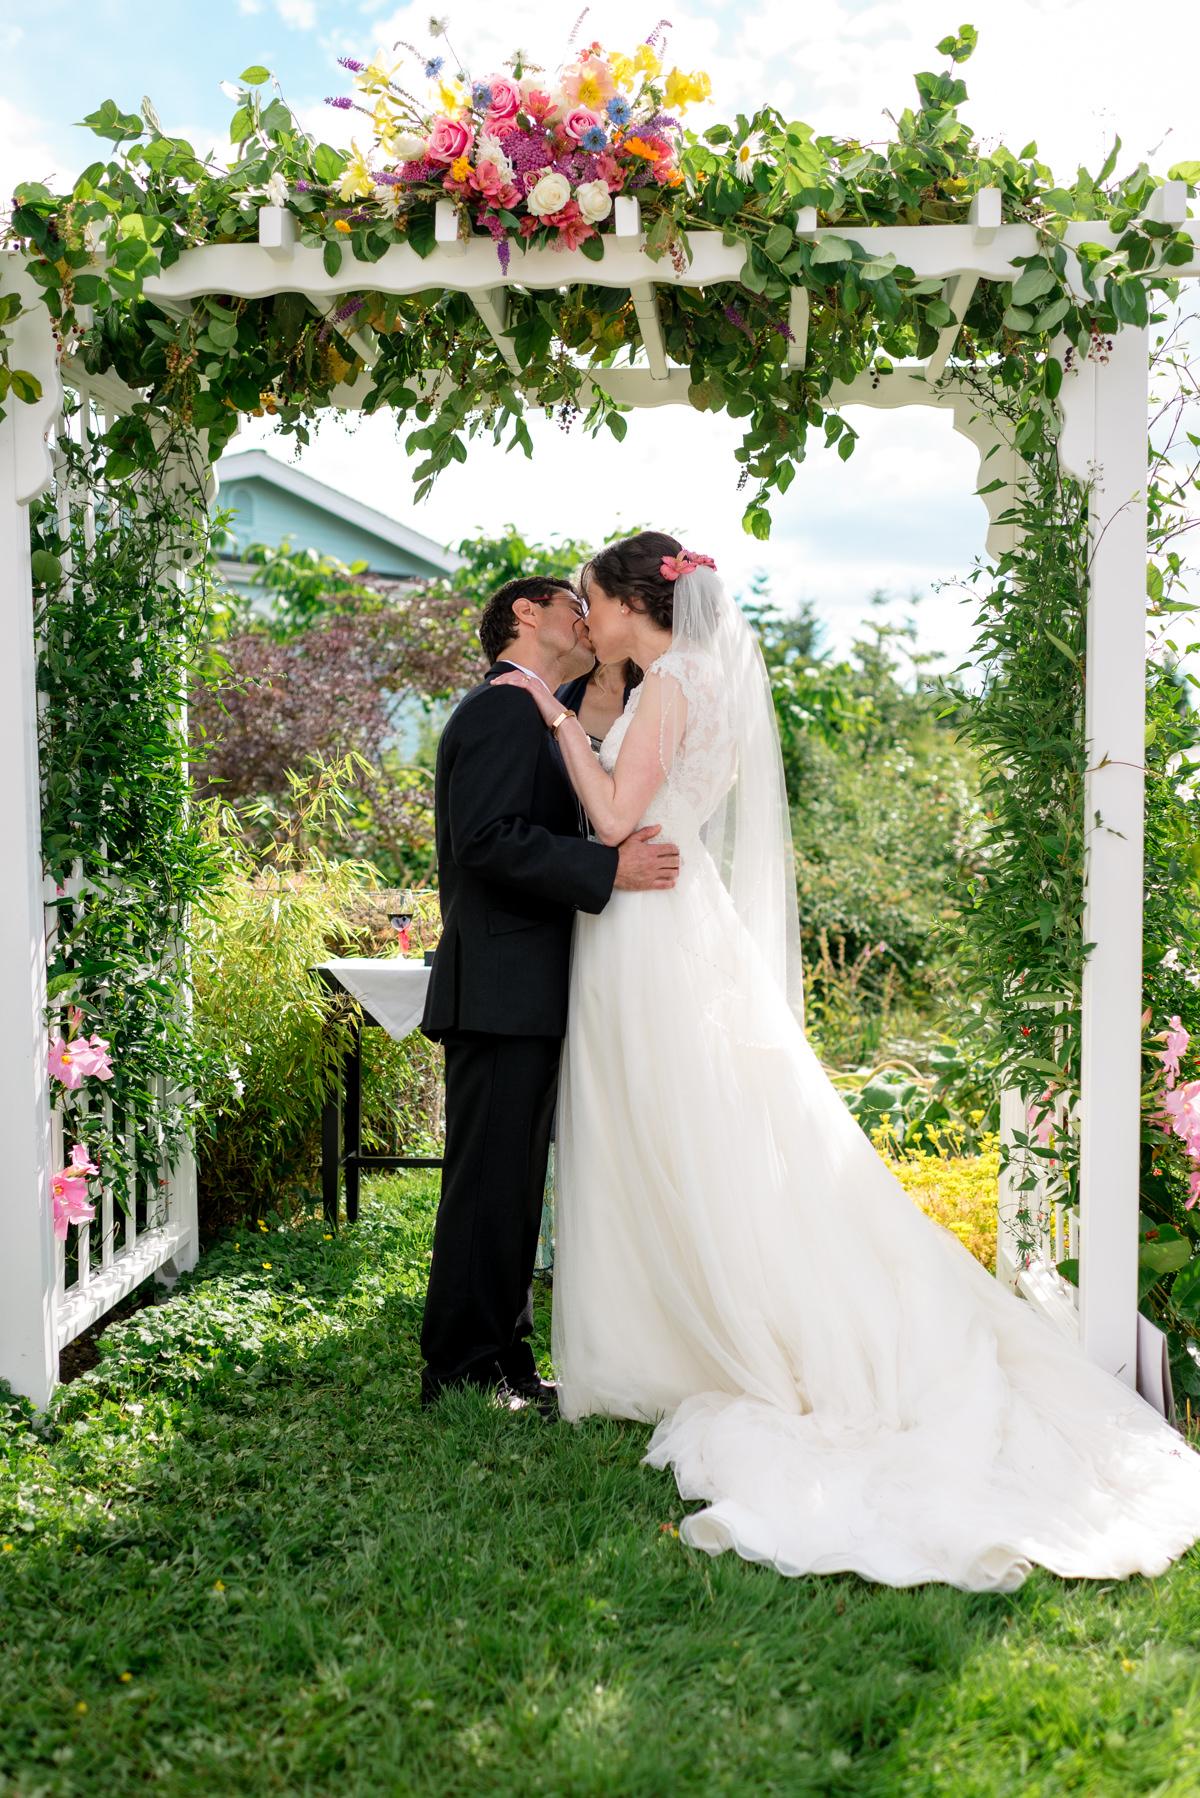 Andrew Tat - Documentary Wedding Photography - Kirkland, Washington - Emily & Cuauh - 14.JPG